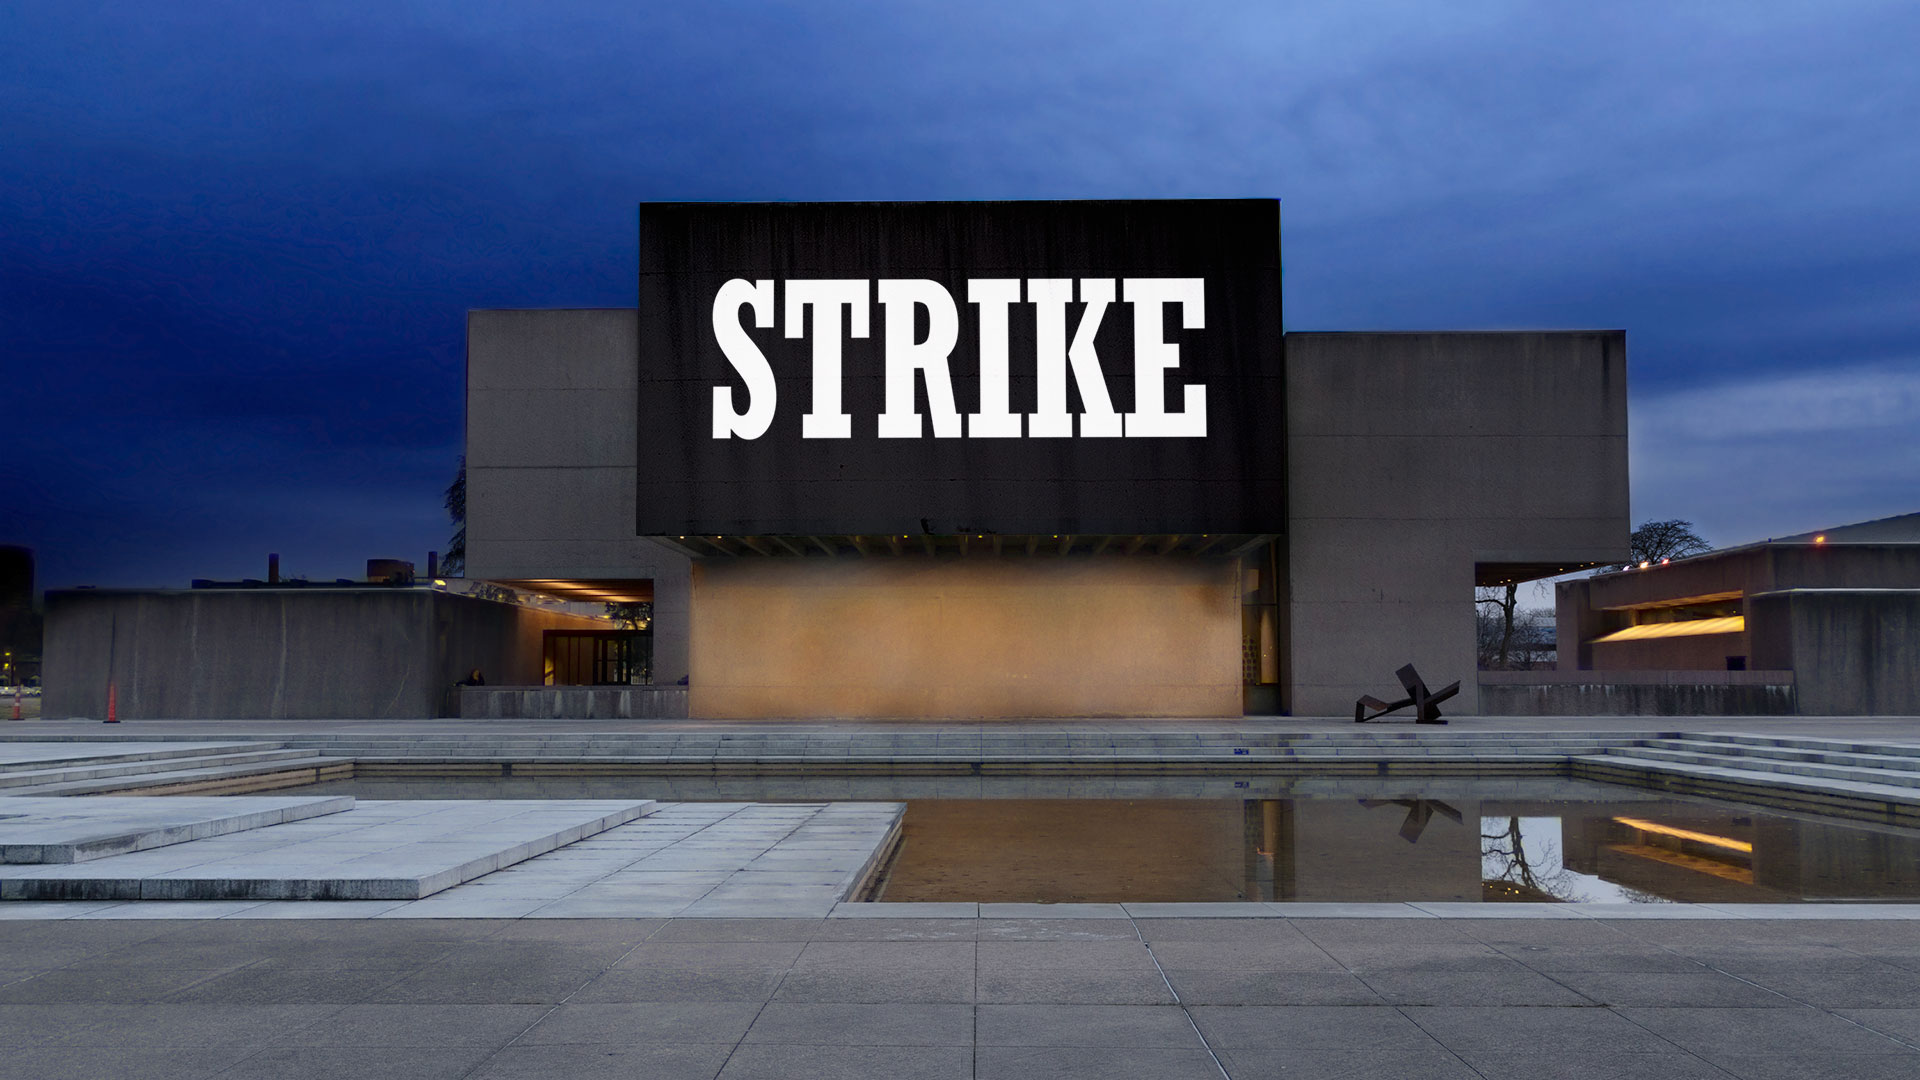 HitoSteyerl_Strike_INSTALL_1920x1080